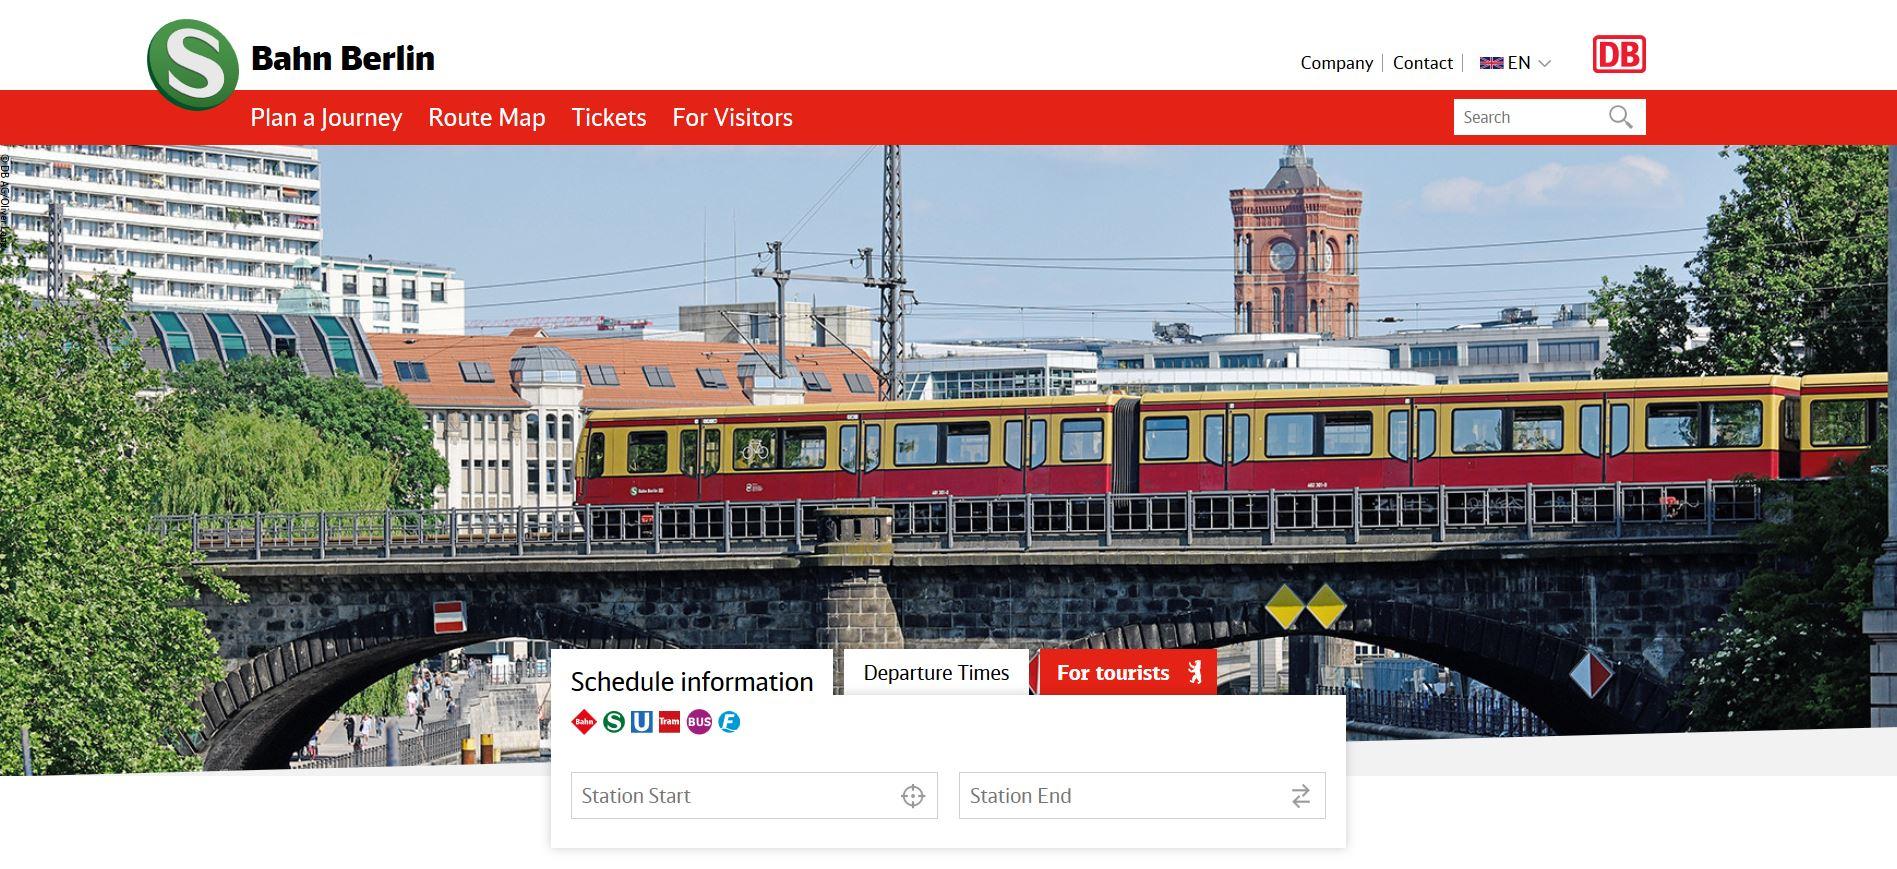 Website S Bahn Berlin Gmbh